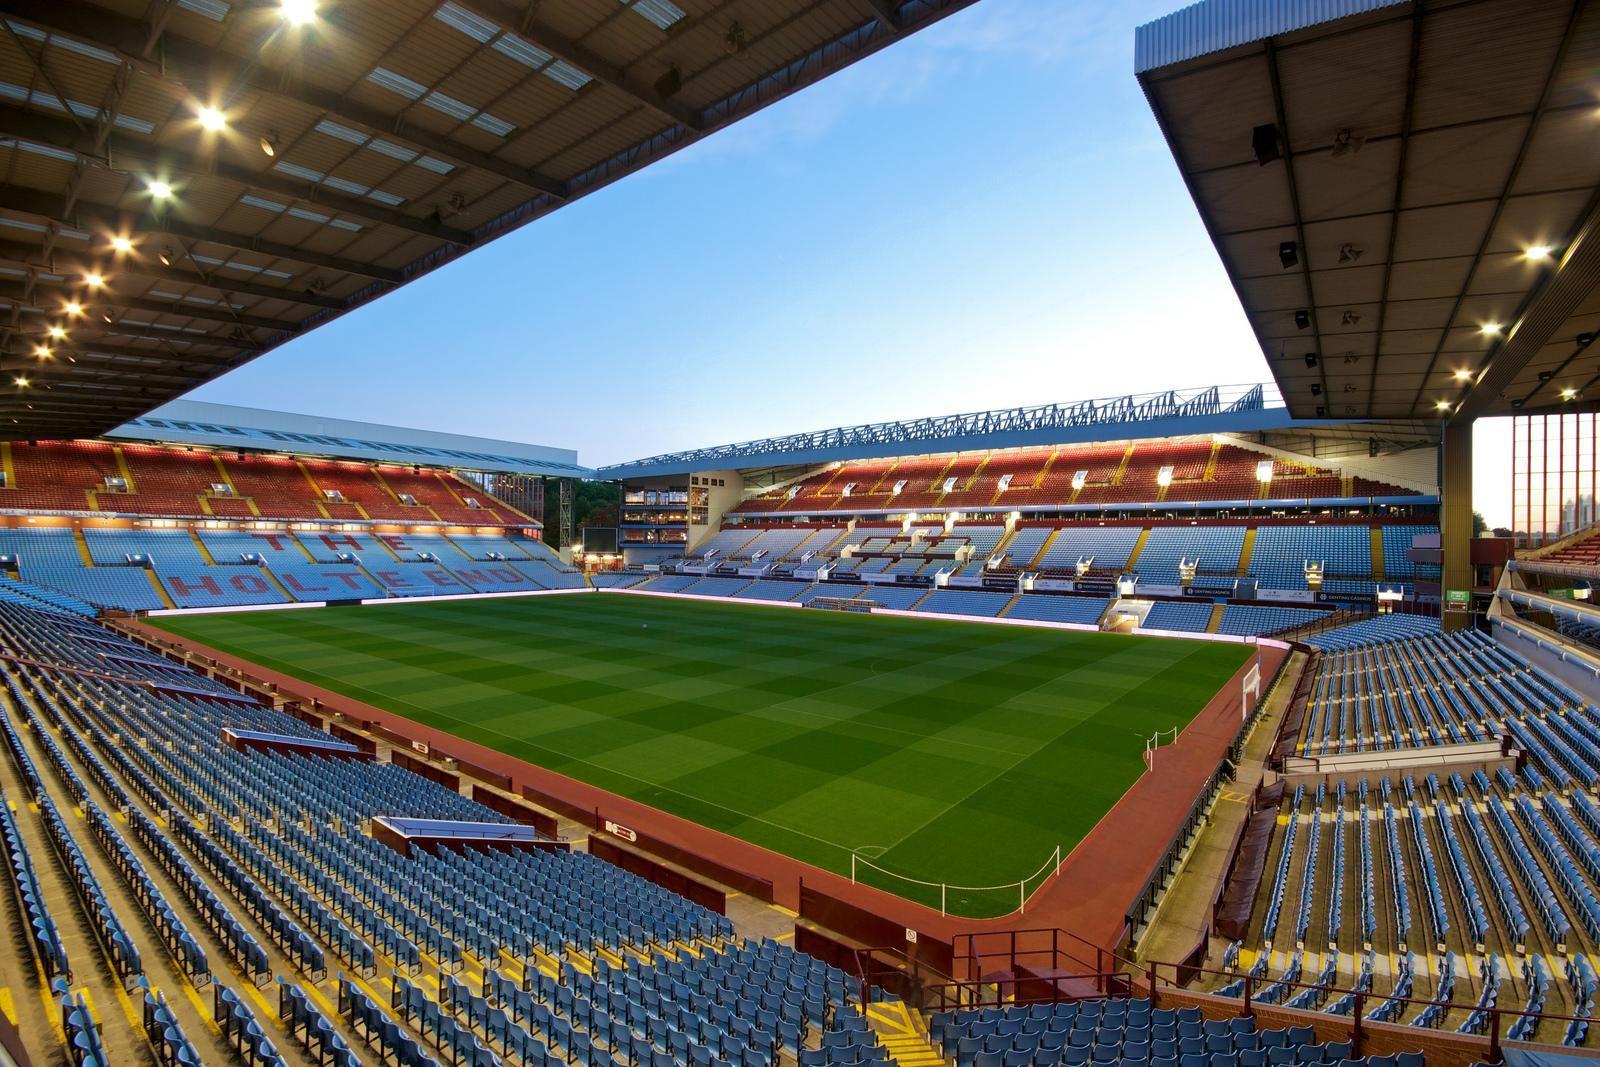 Villa Park - Aston Villa